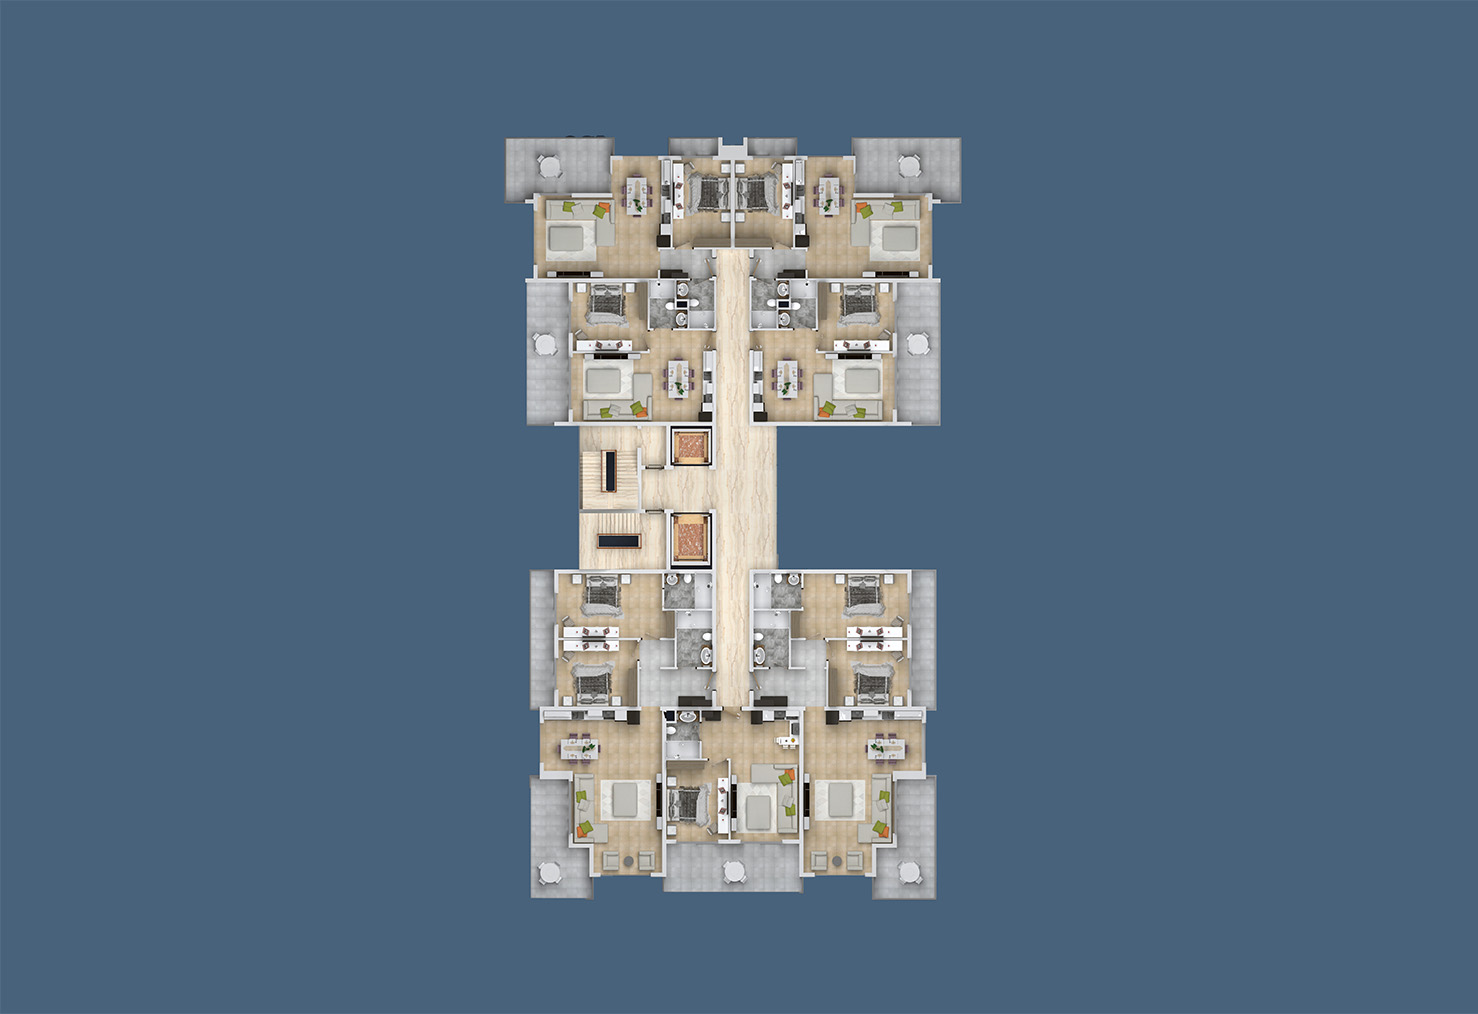 Floor plans of apartments 7 floor «B» Yekta Kingdom Trade Center